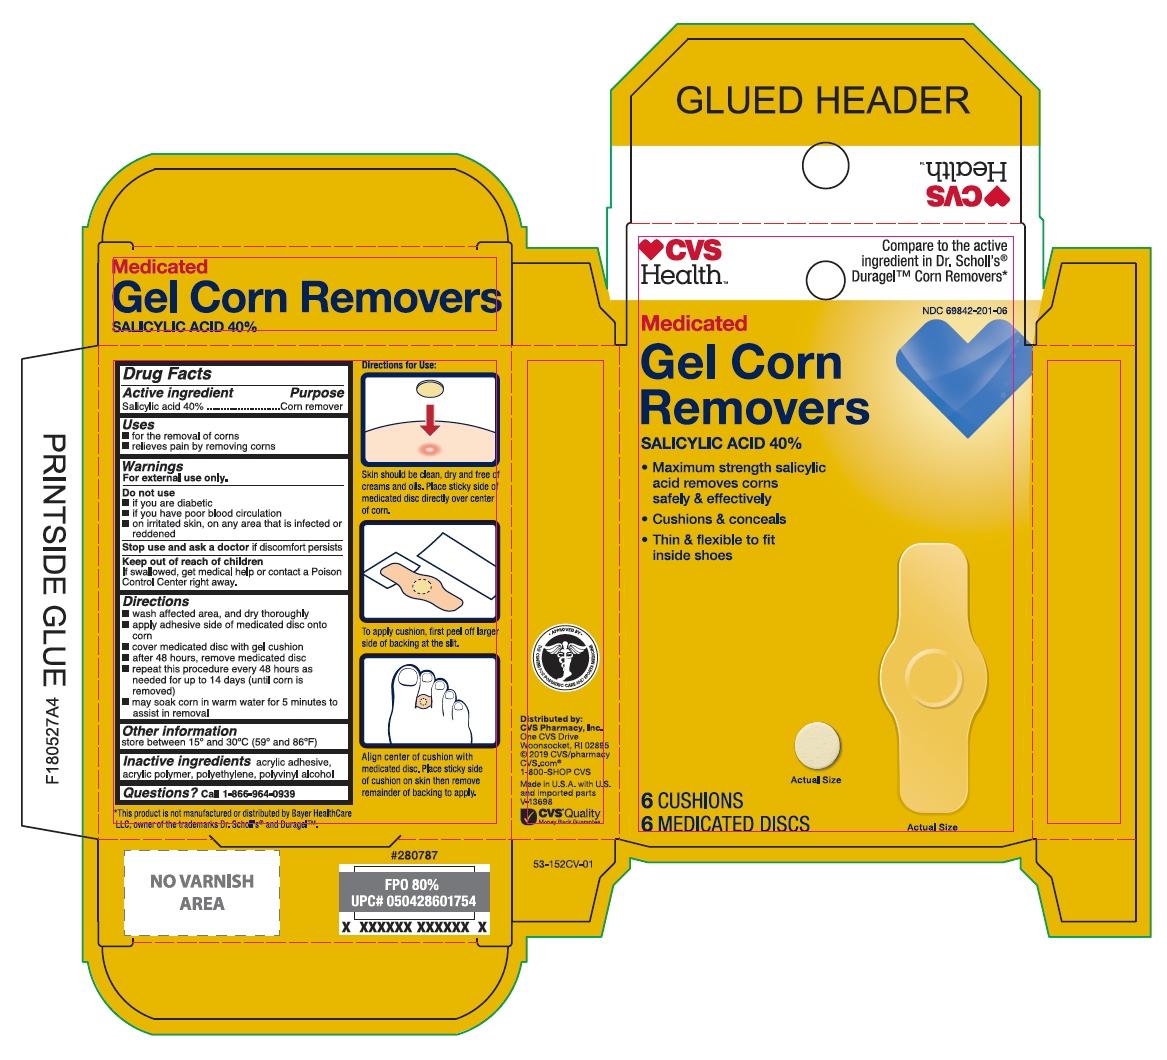 gel corn removers